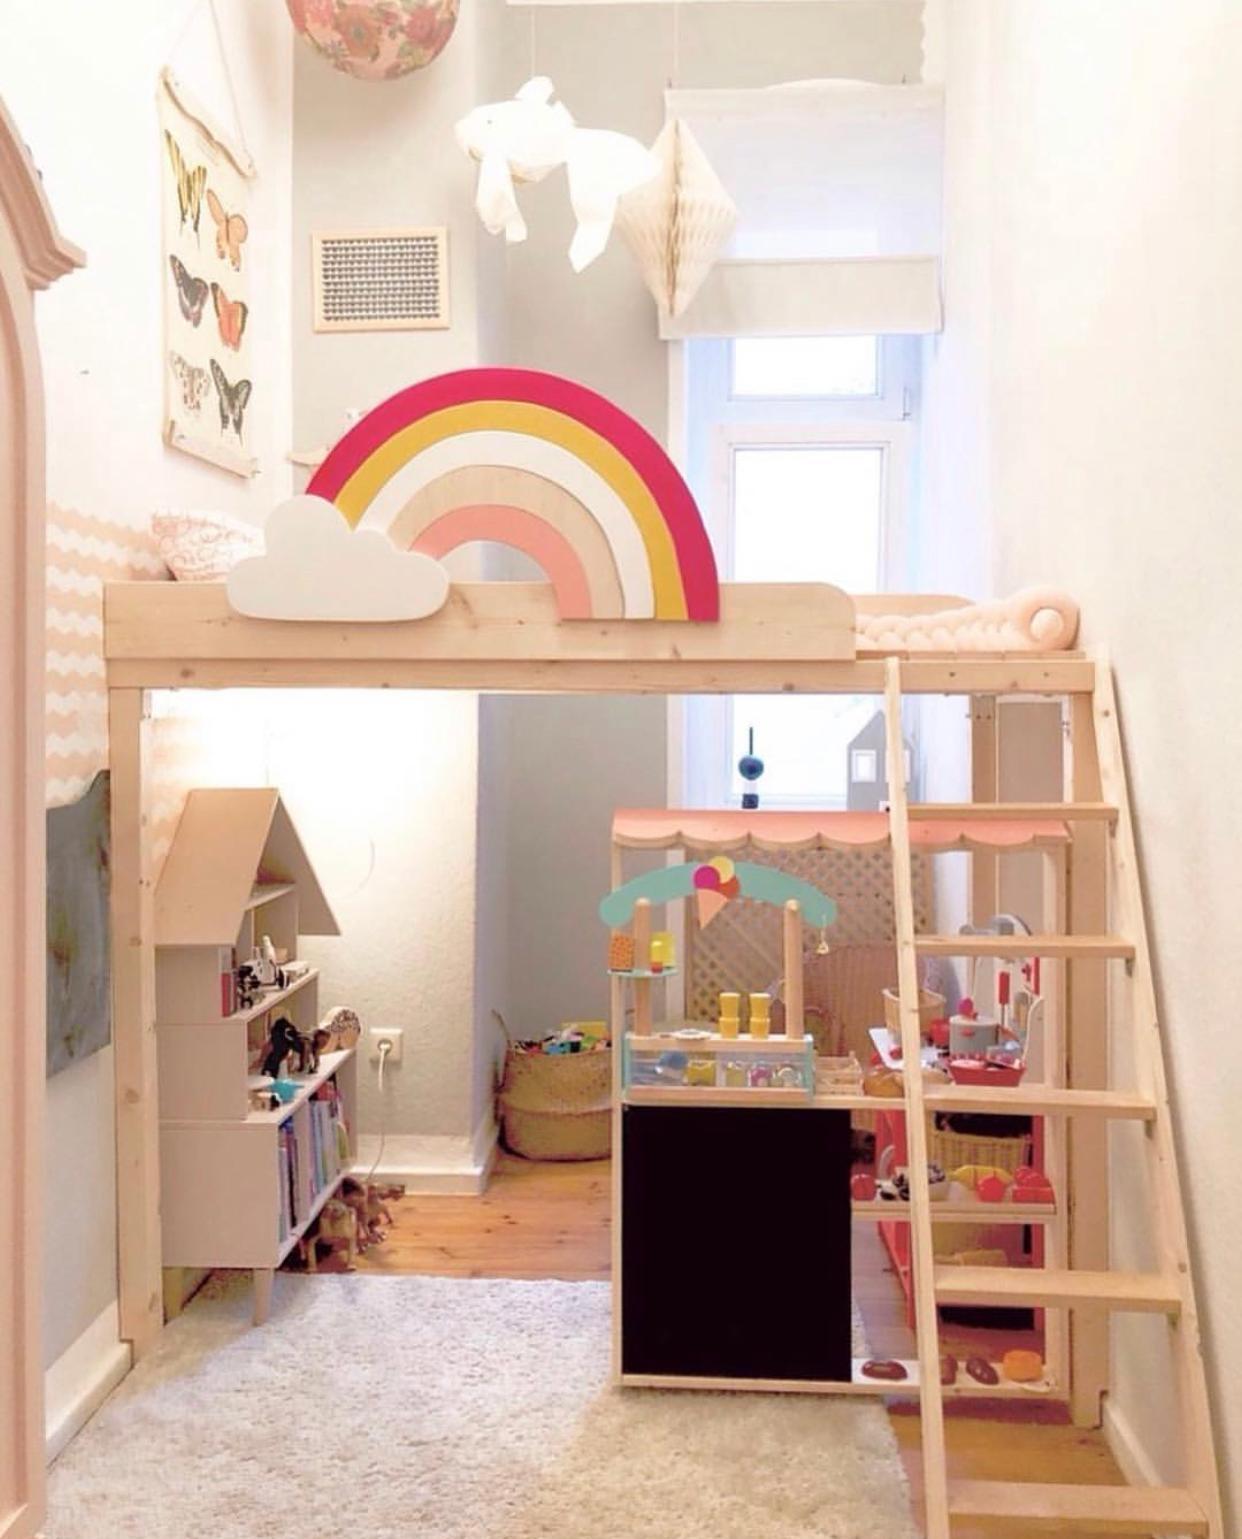 Full Size of Kinderzimmer Hochbett Regenbogen Diy Altbau Be Regal Weiß Regale Sofa Kinderzimmer Kinderzimmer Hochbett